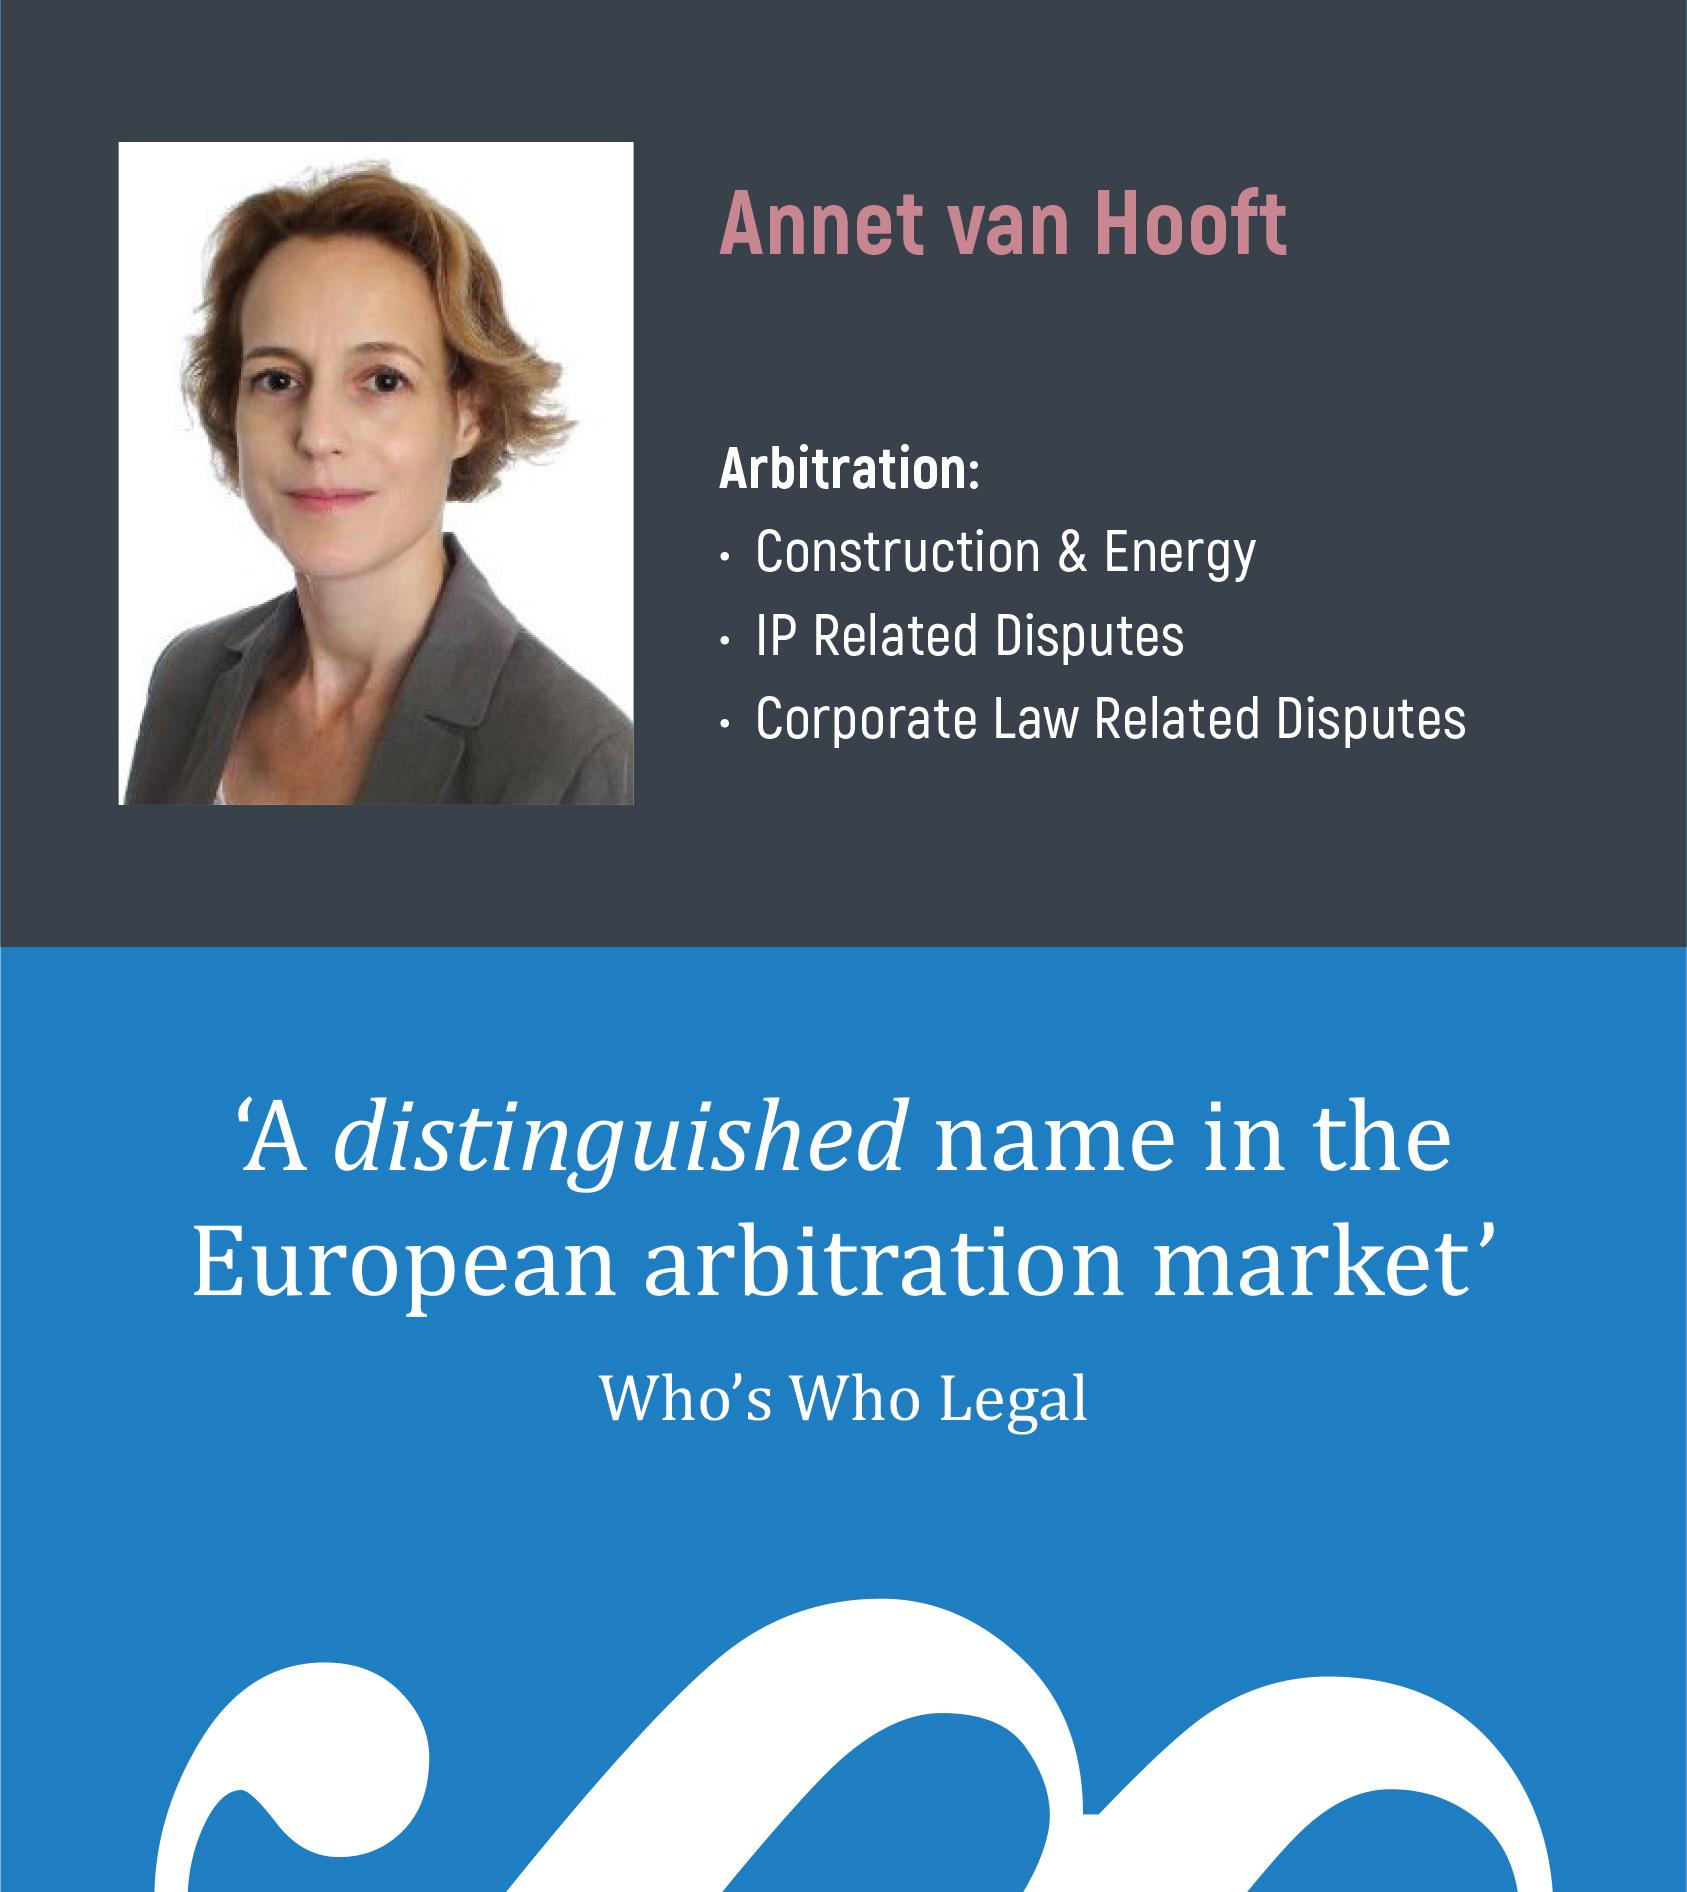 Annet van Hooft